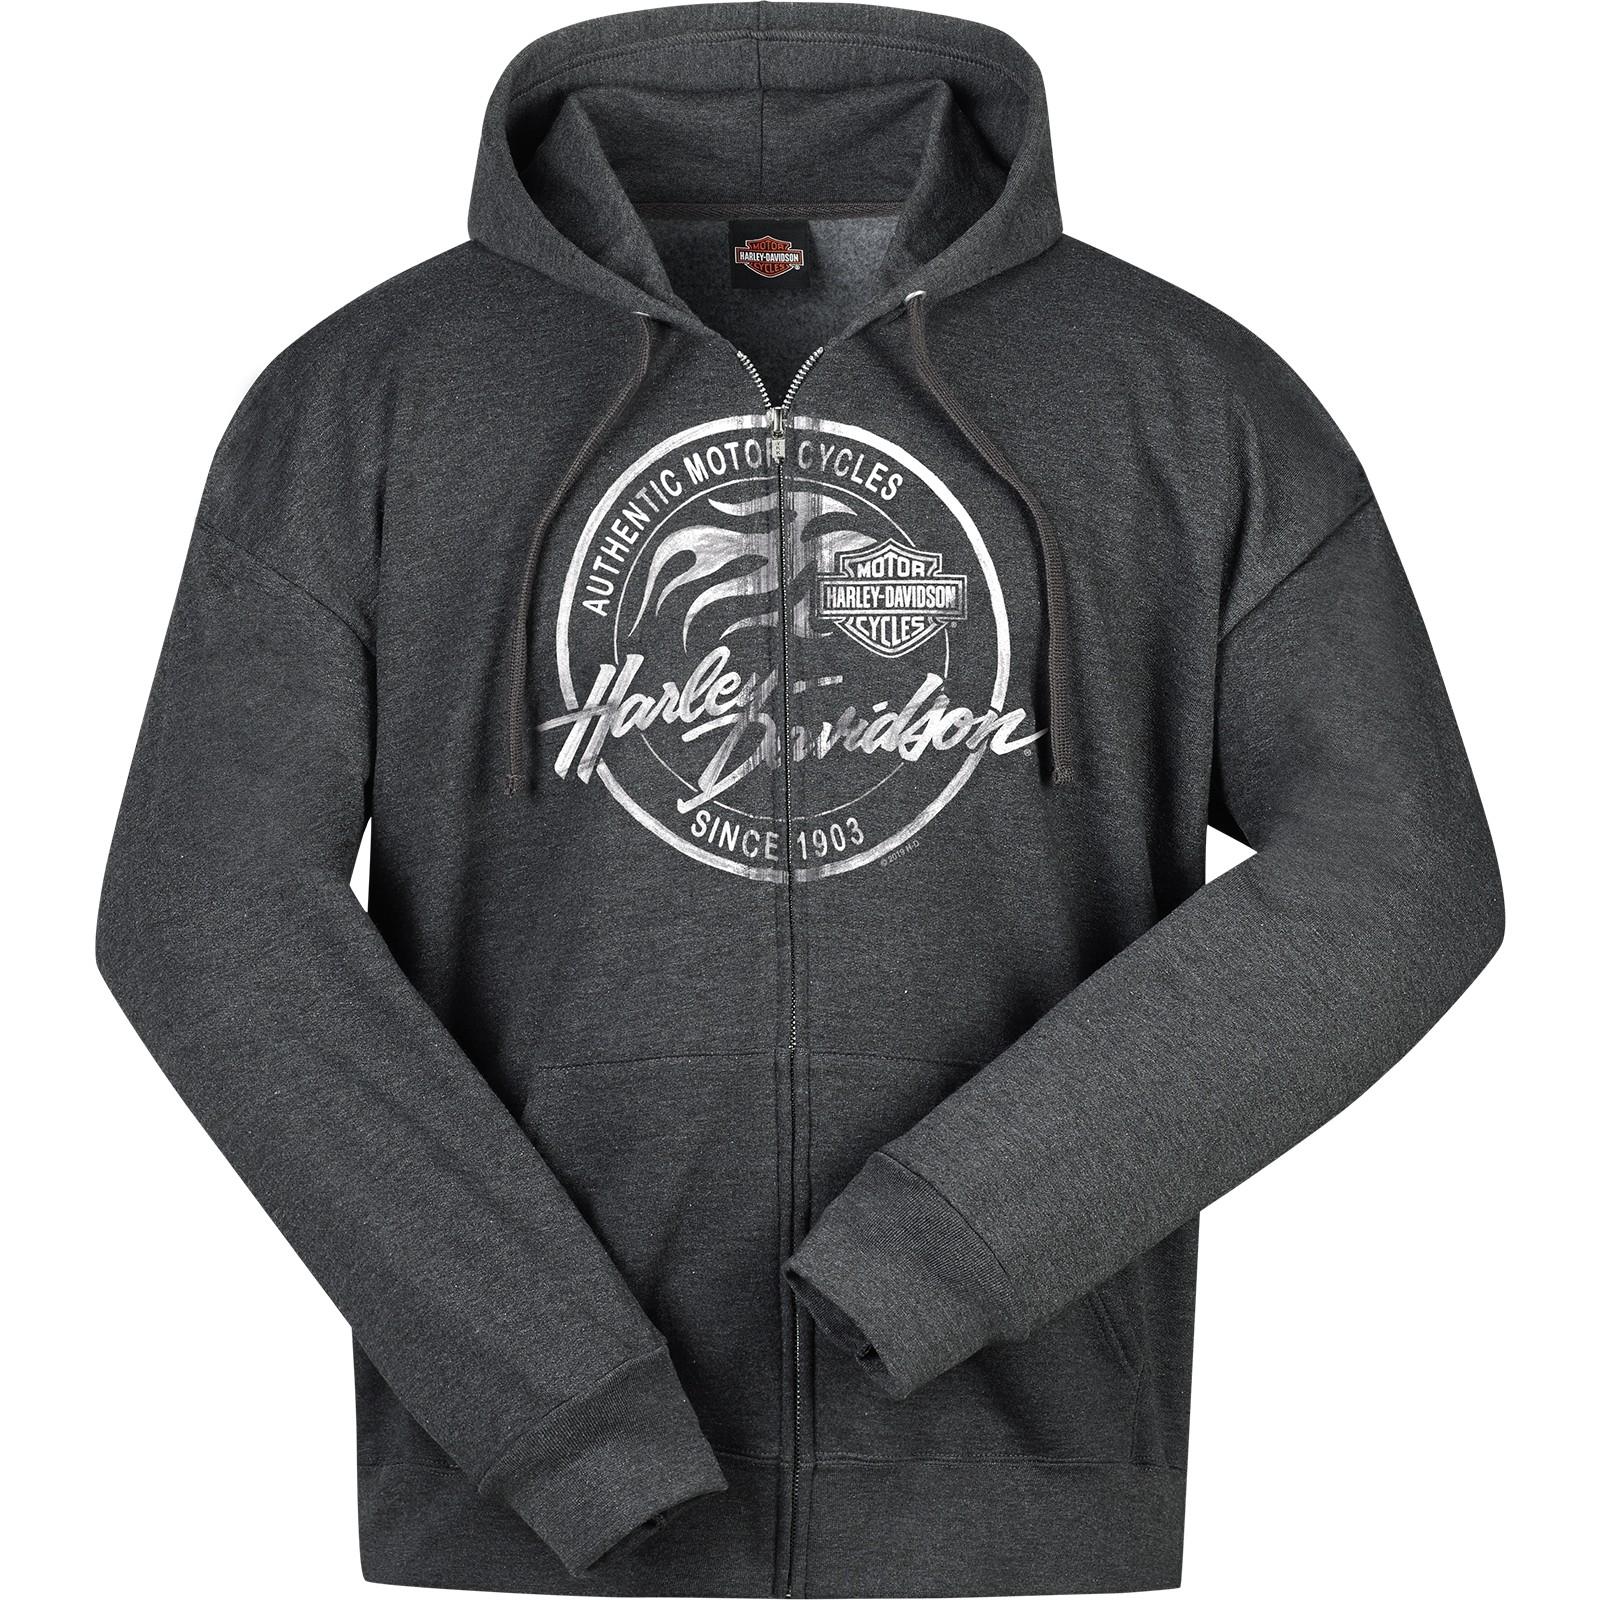 Men's Charcoal Heather Hooded Zippered Sweatshirt - Overseas Tour   Paint Logo